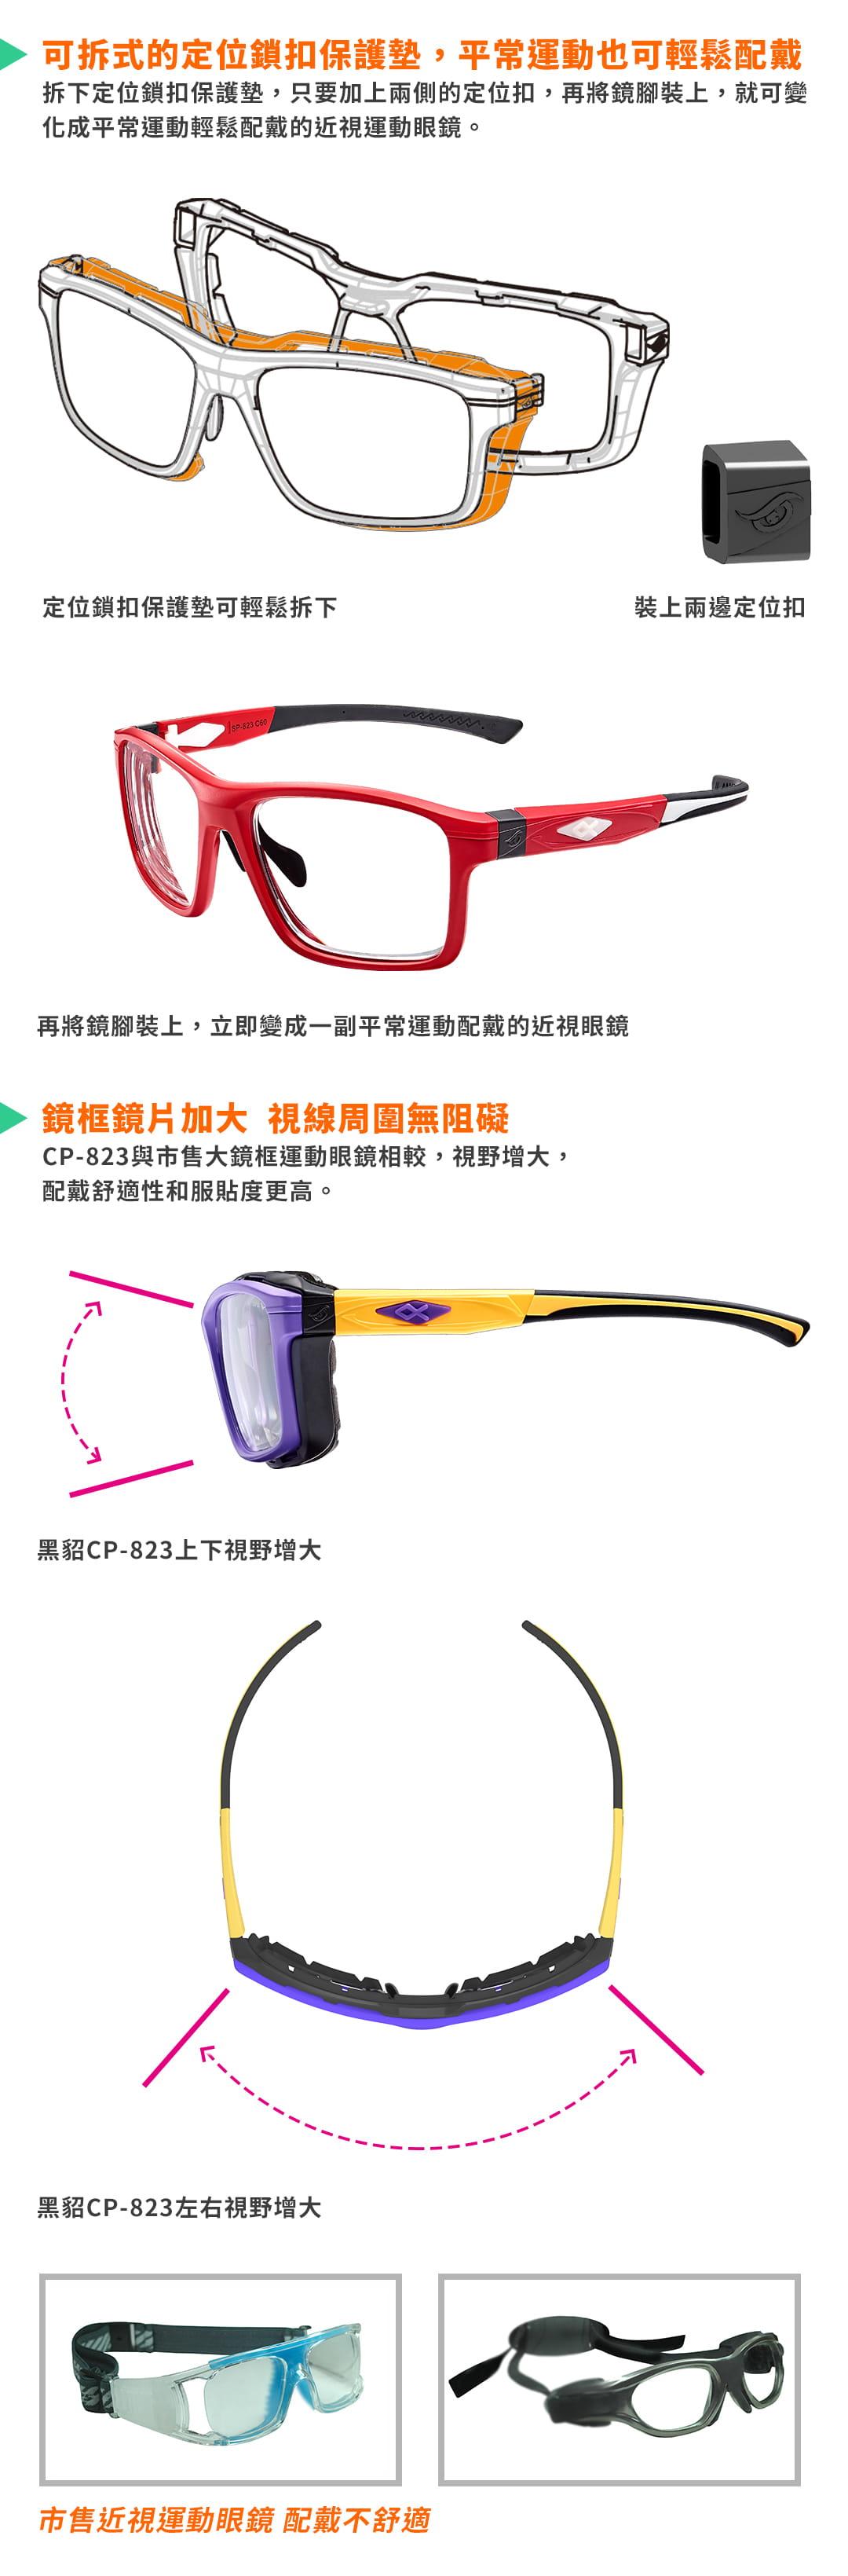 SABLE黑貂光學-專屬球類運動眼鏡CP-823(標準款-無保護墊)+SP-03(平光精緻鍍膜鏡片) 1